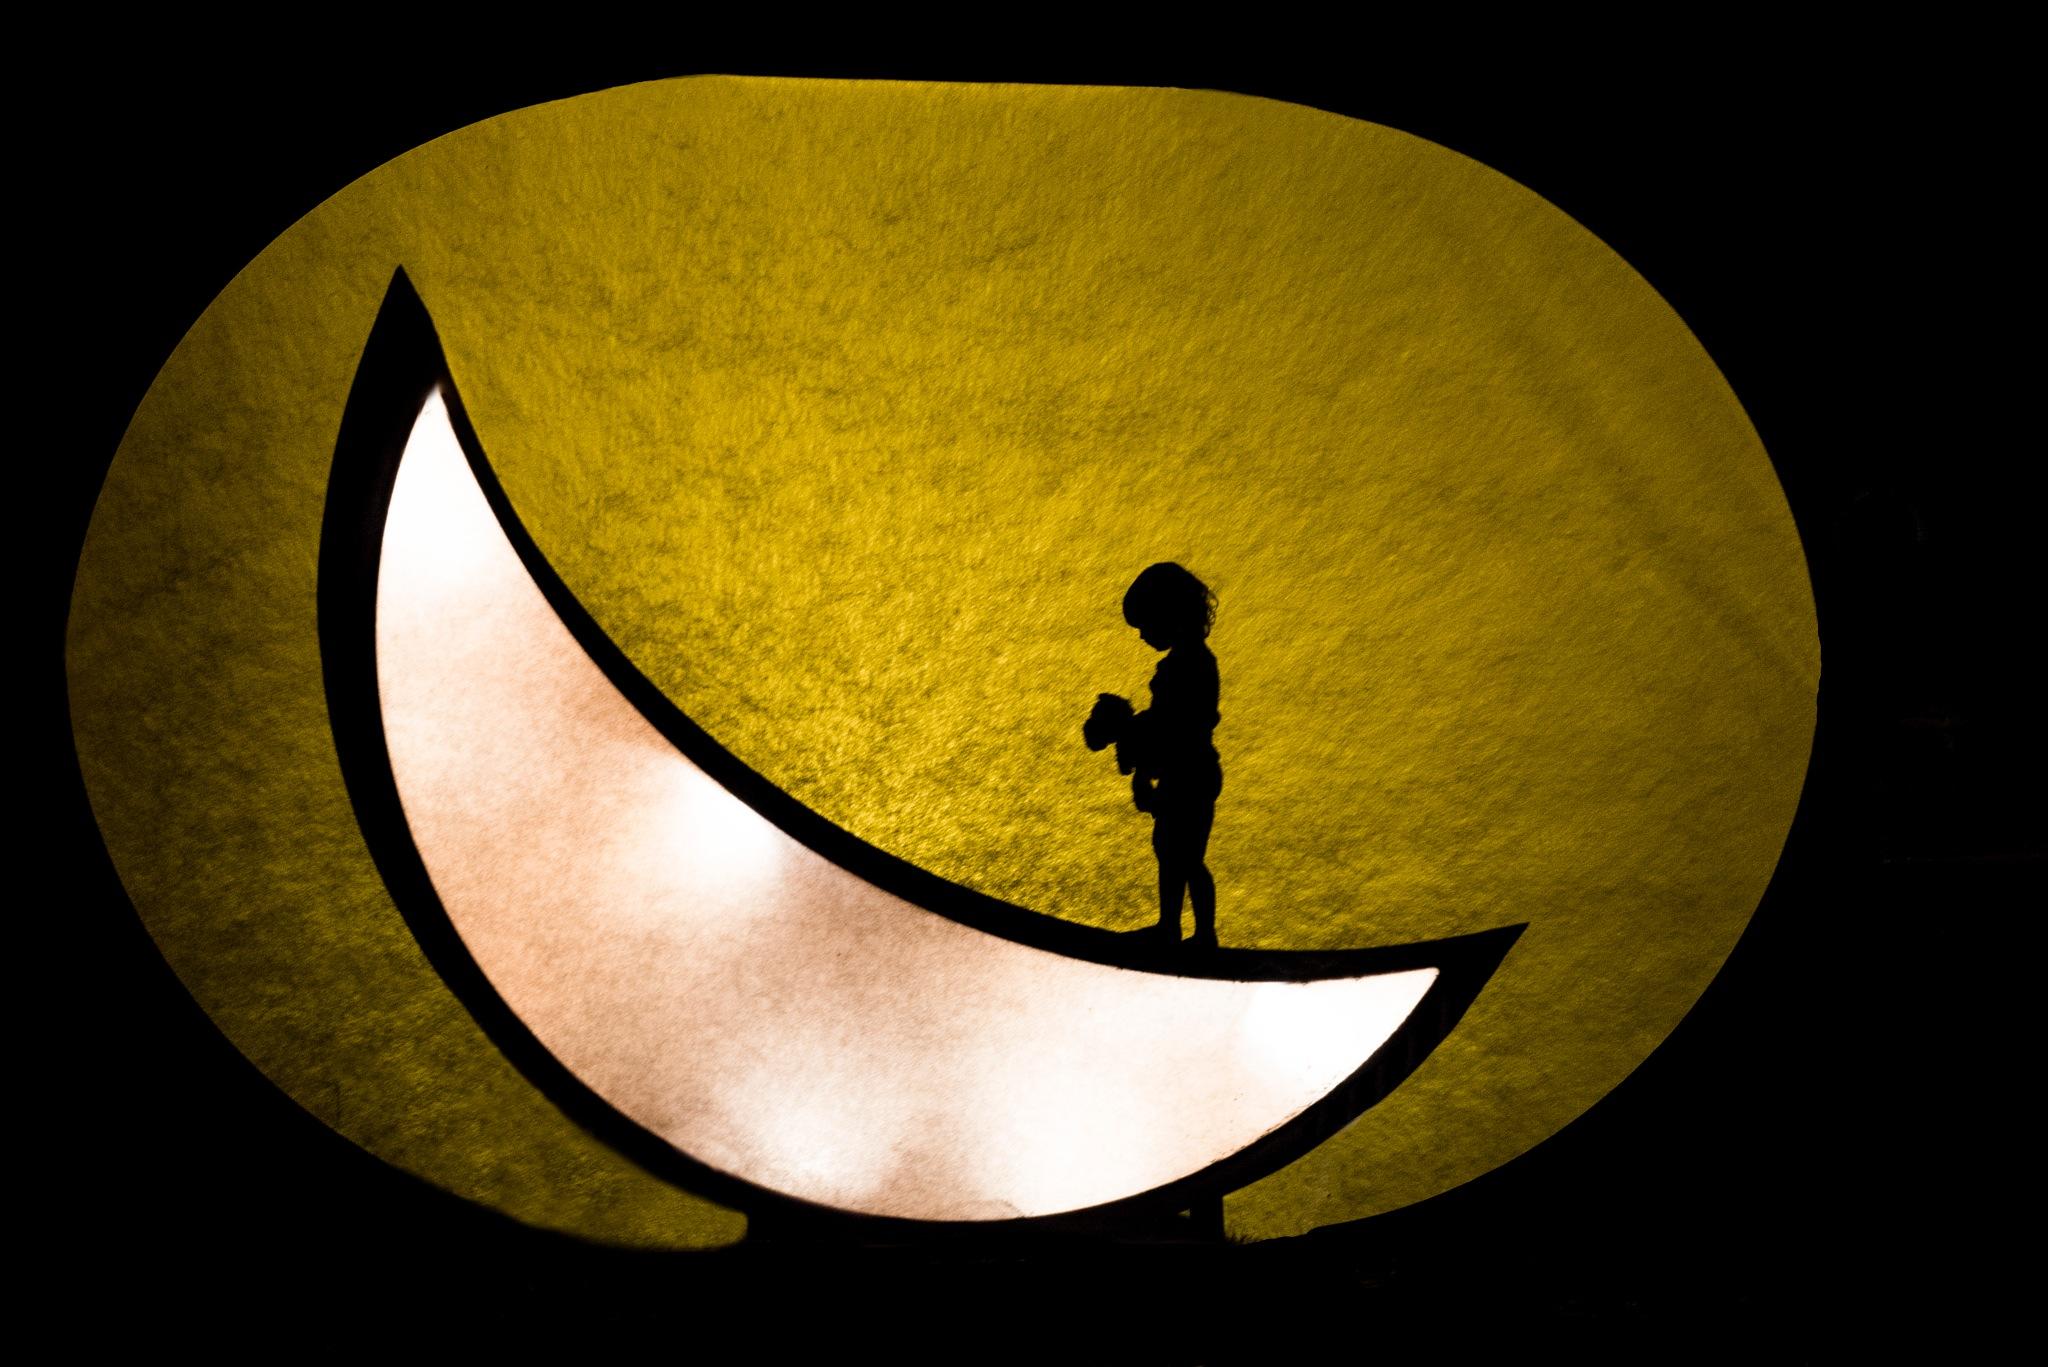 Twinkle twinkle little star by Linda Persson